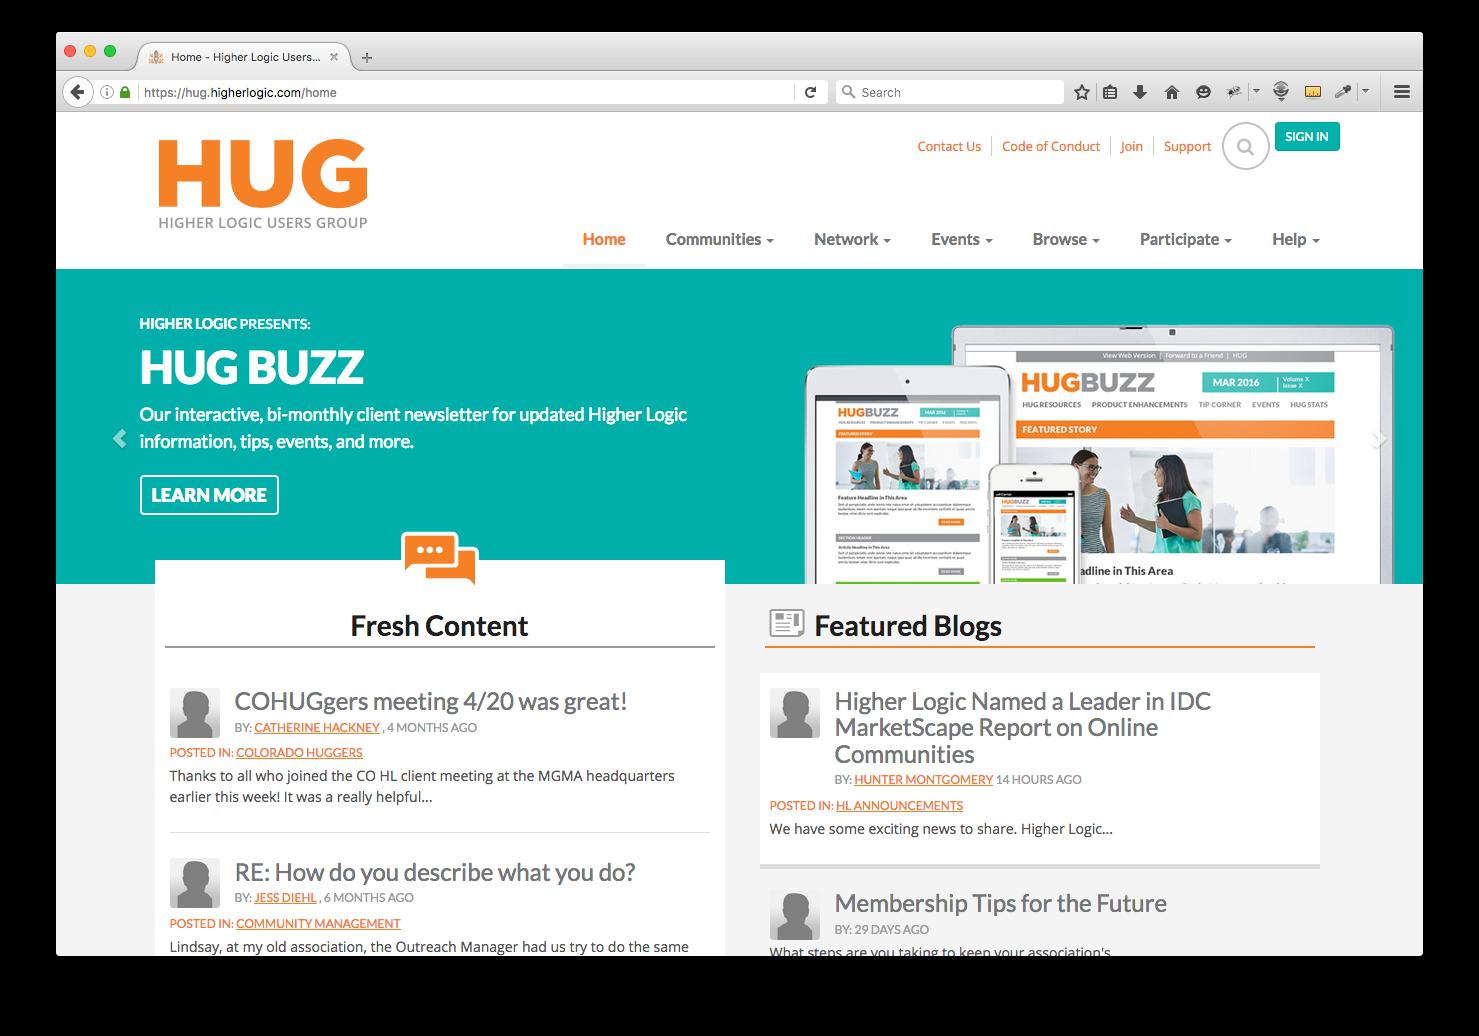 HUG Screenshot